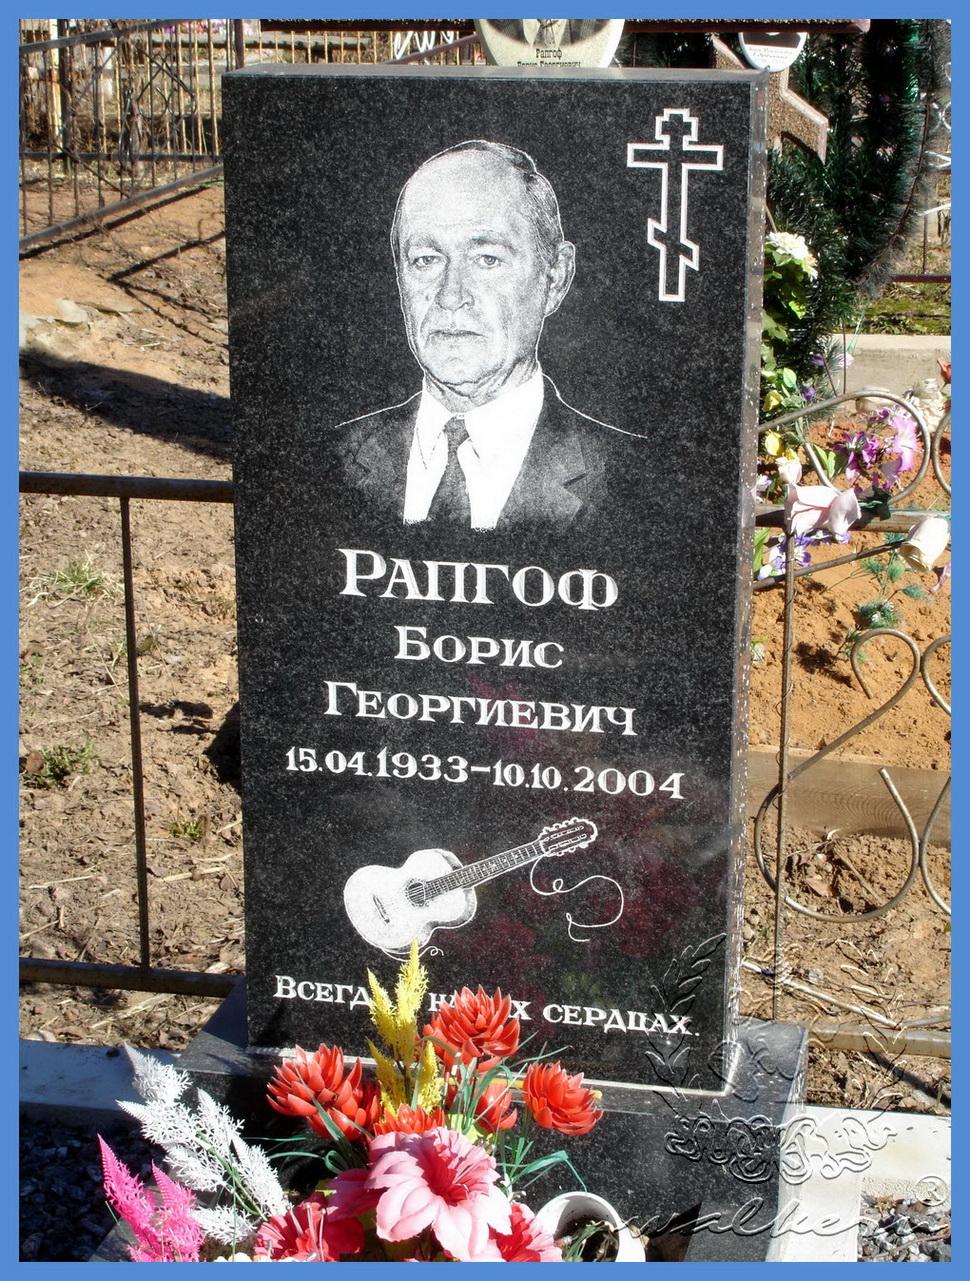 Рапгоф Борис Георгиевич